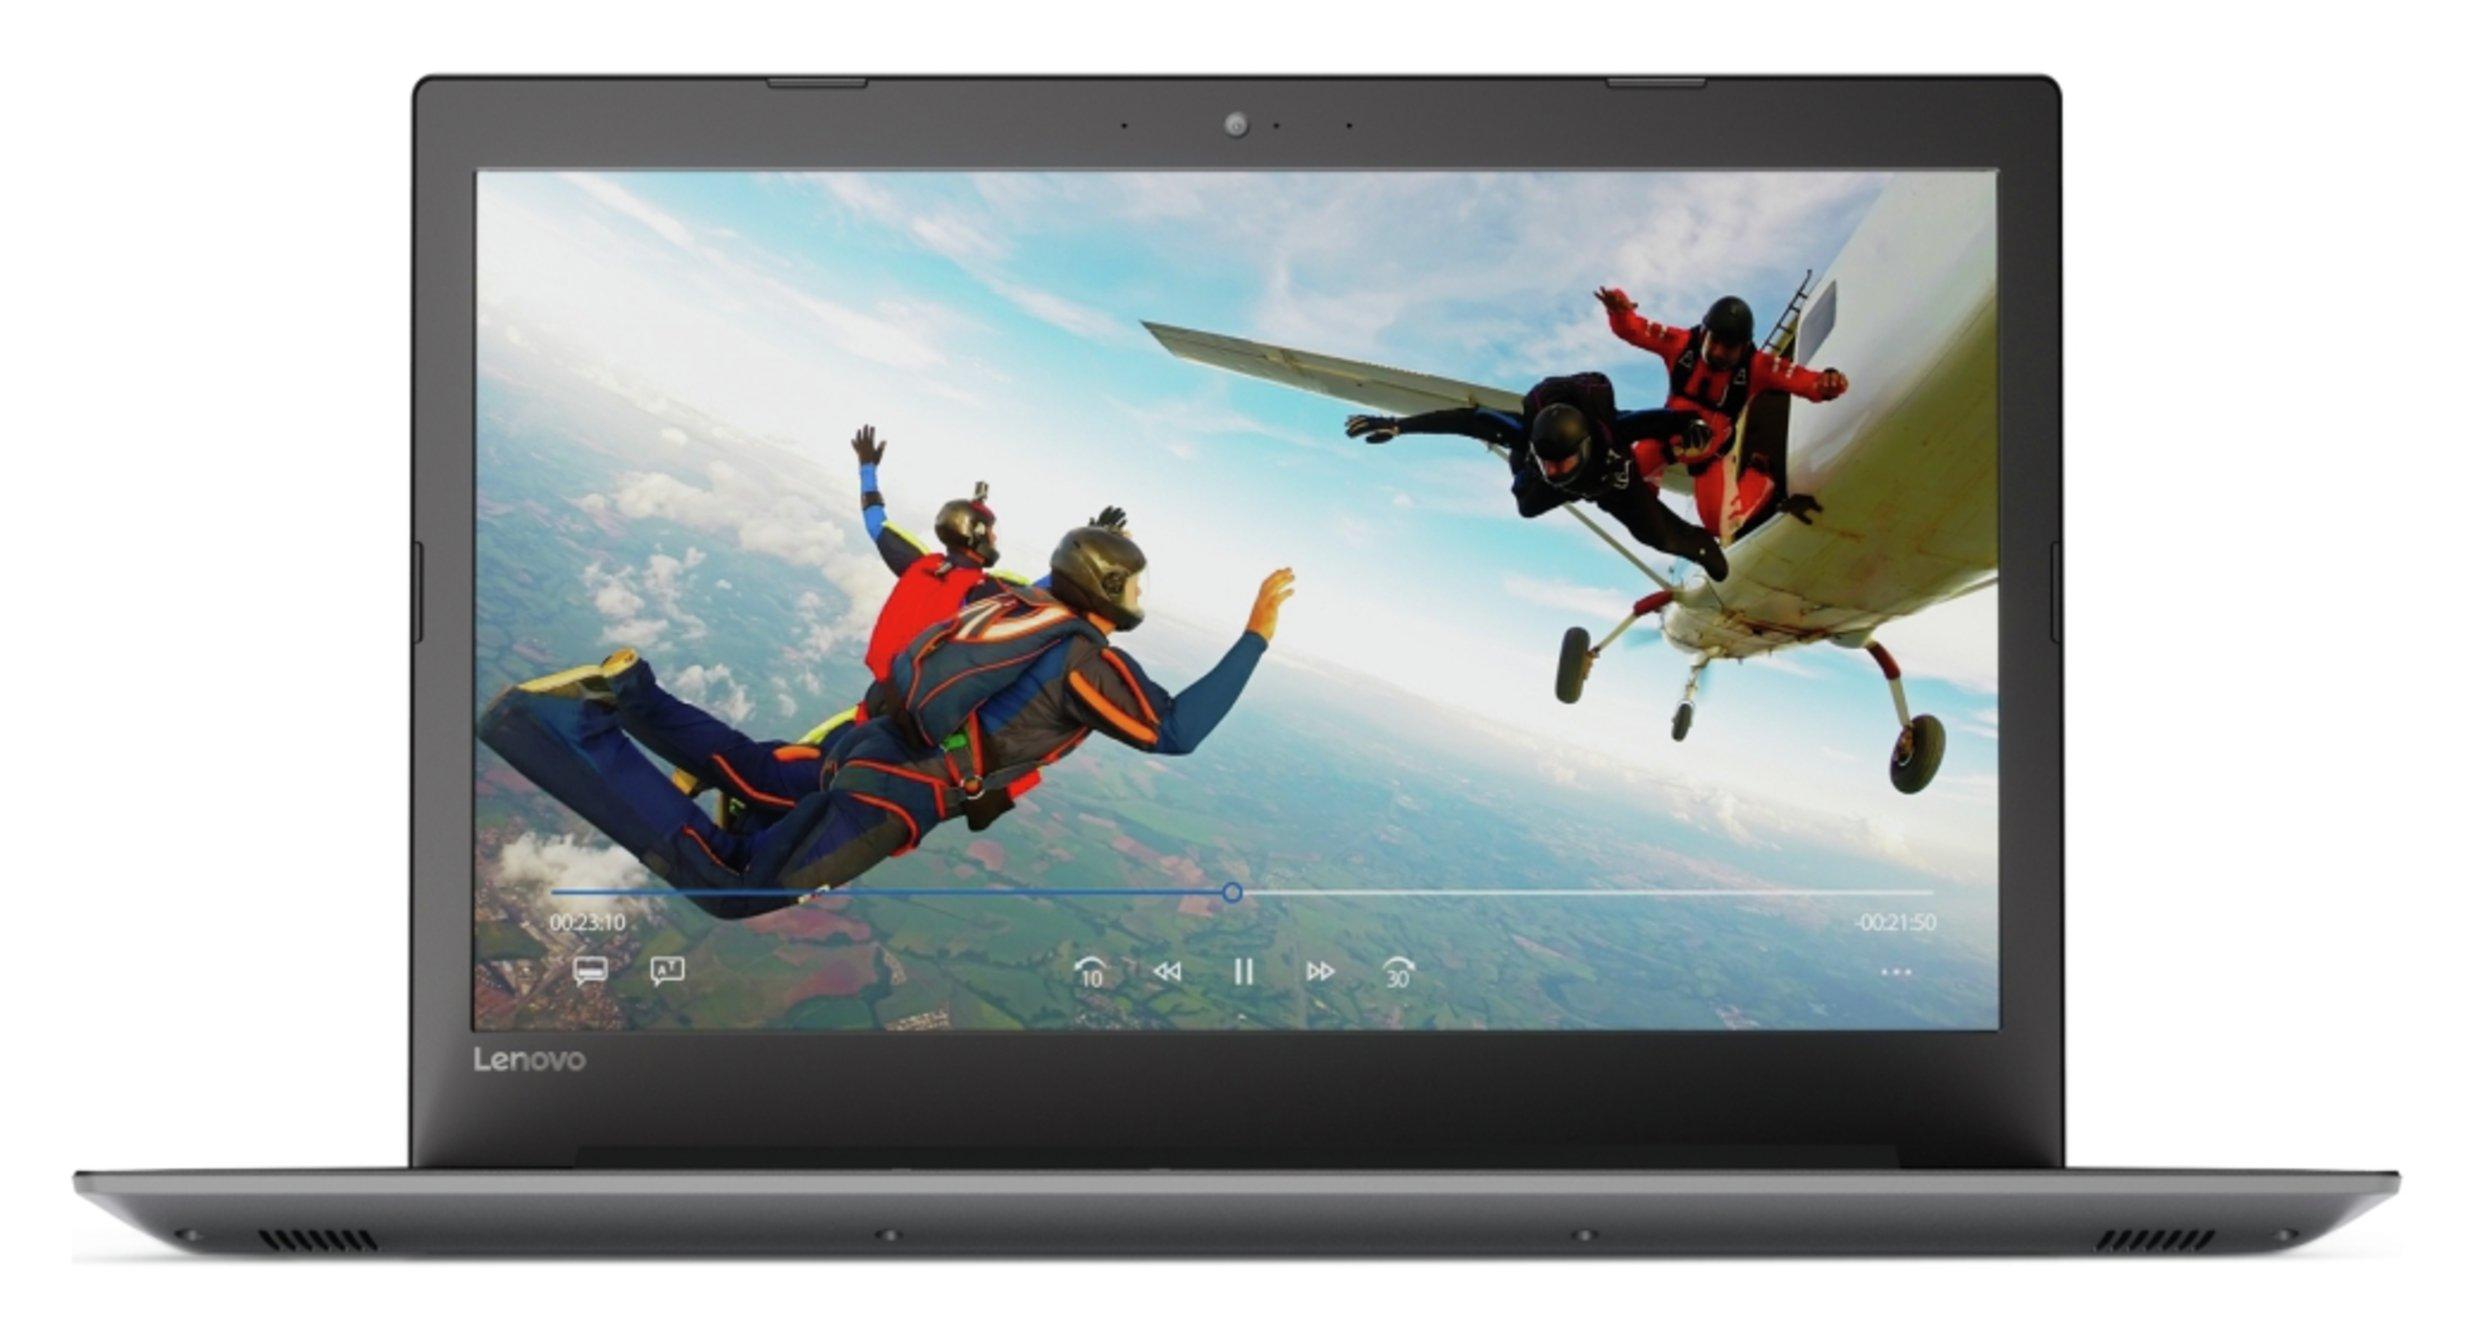 Lenovo 320 17.3 Inch AMD A4 8GB 1TB Laptop - Black